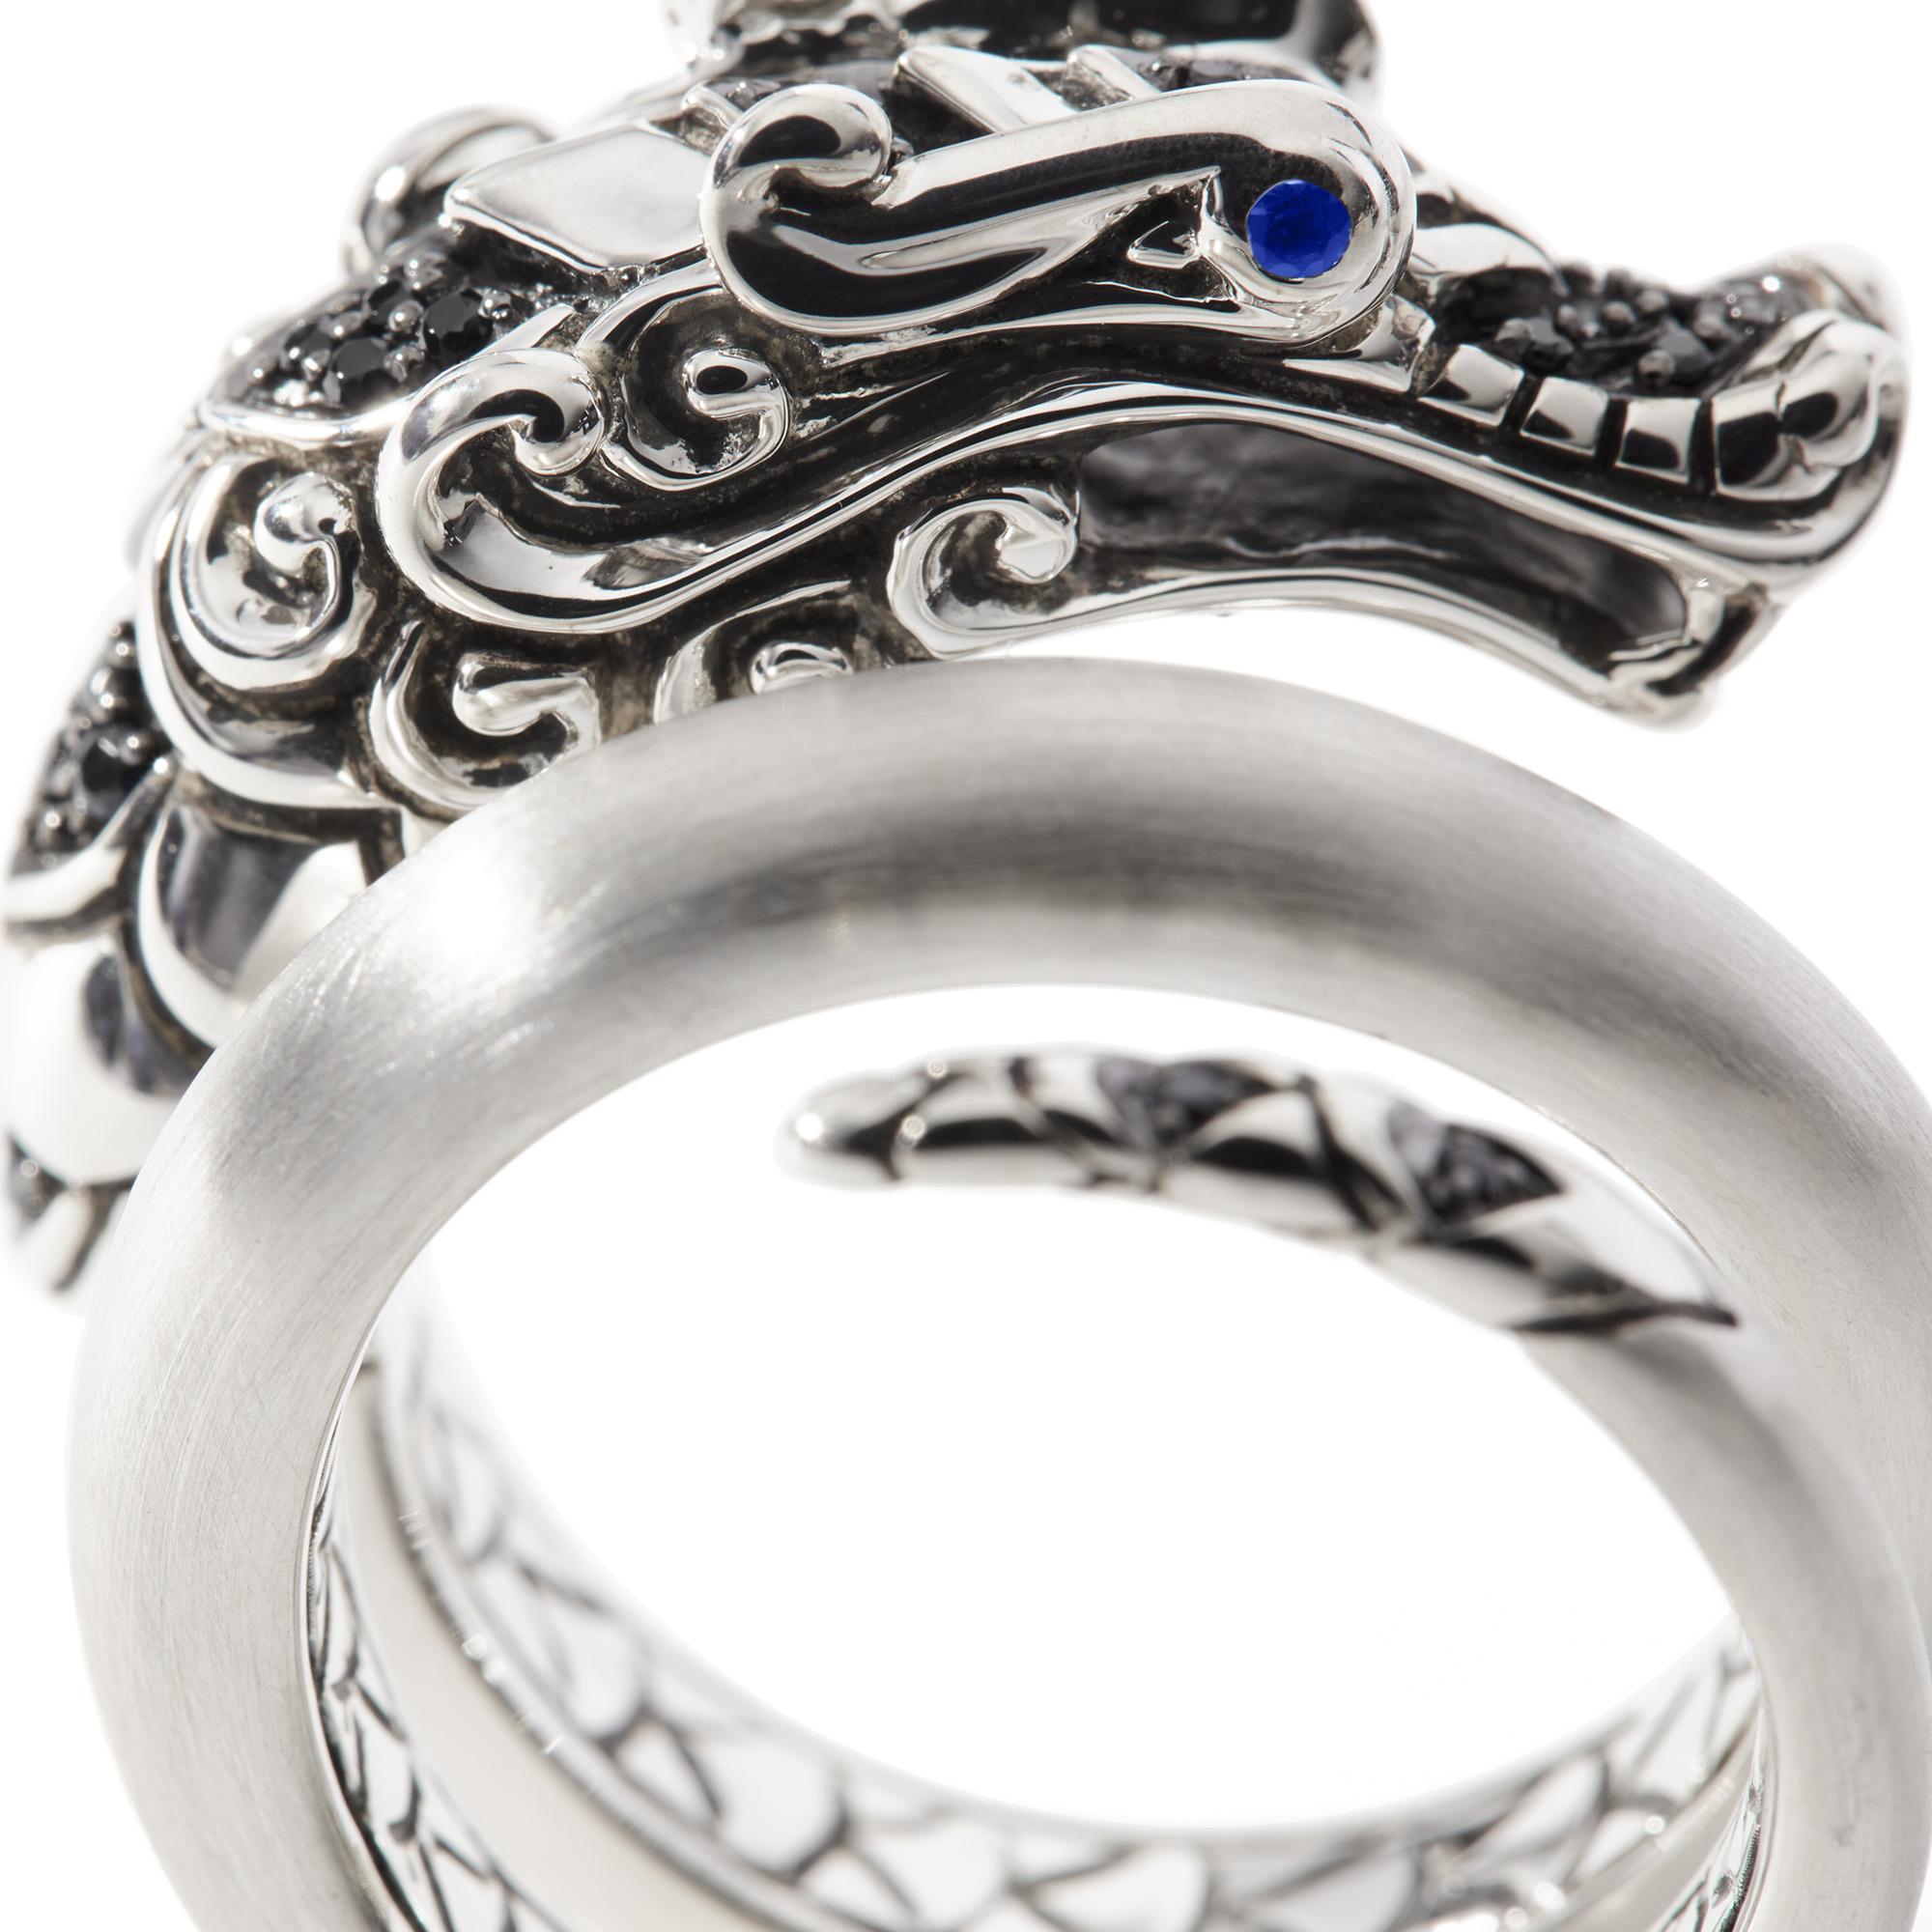 Legends Naga Ring in Brushed Silver with Gemstone, Black Spinel, large